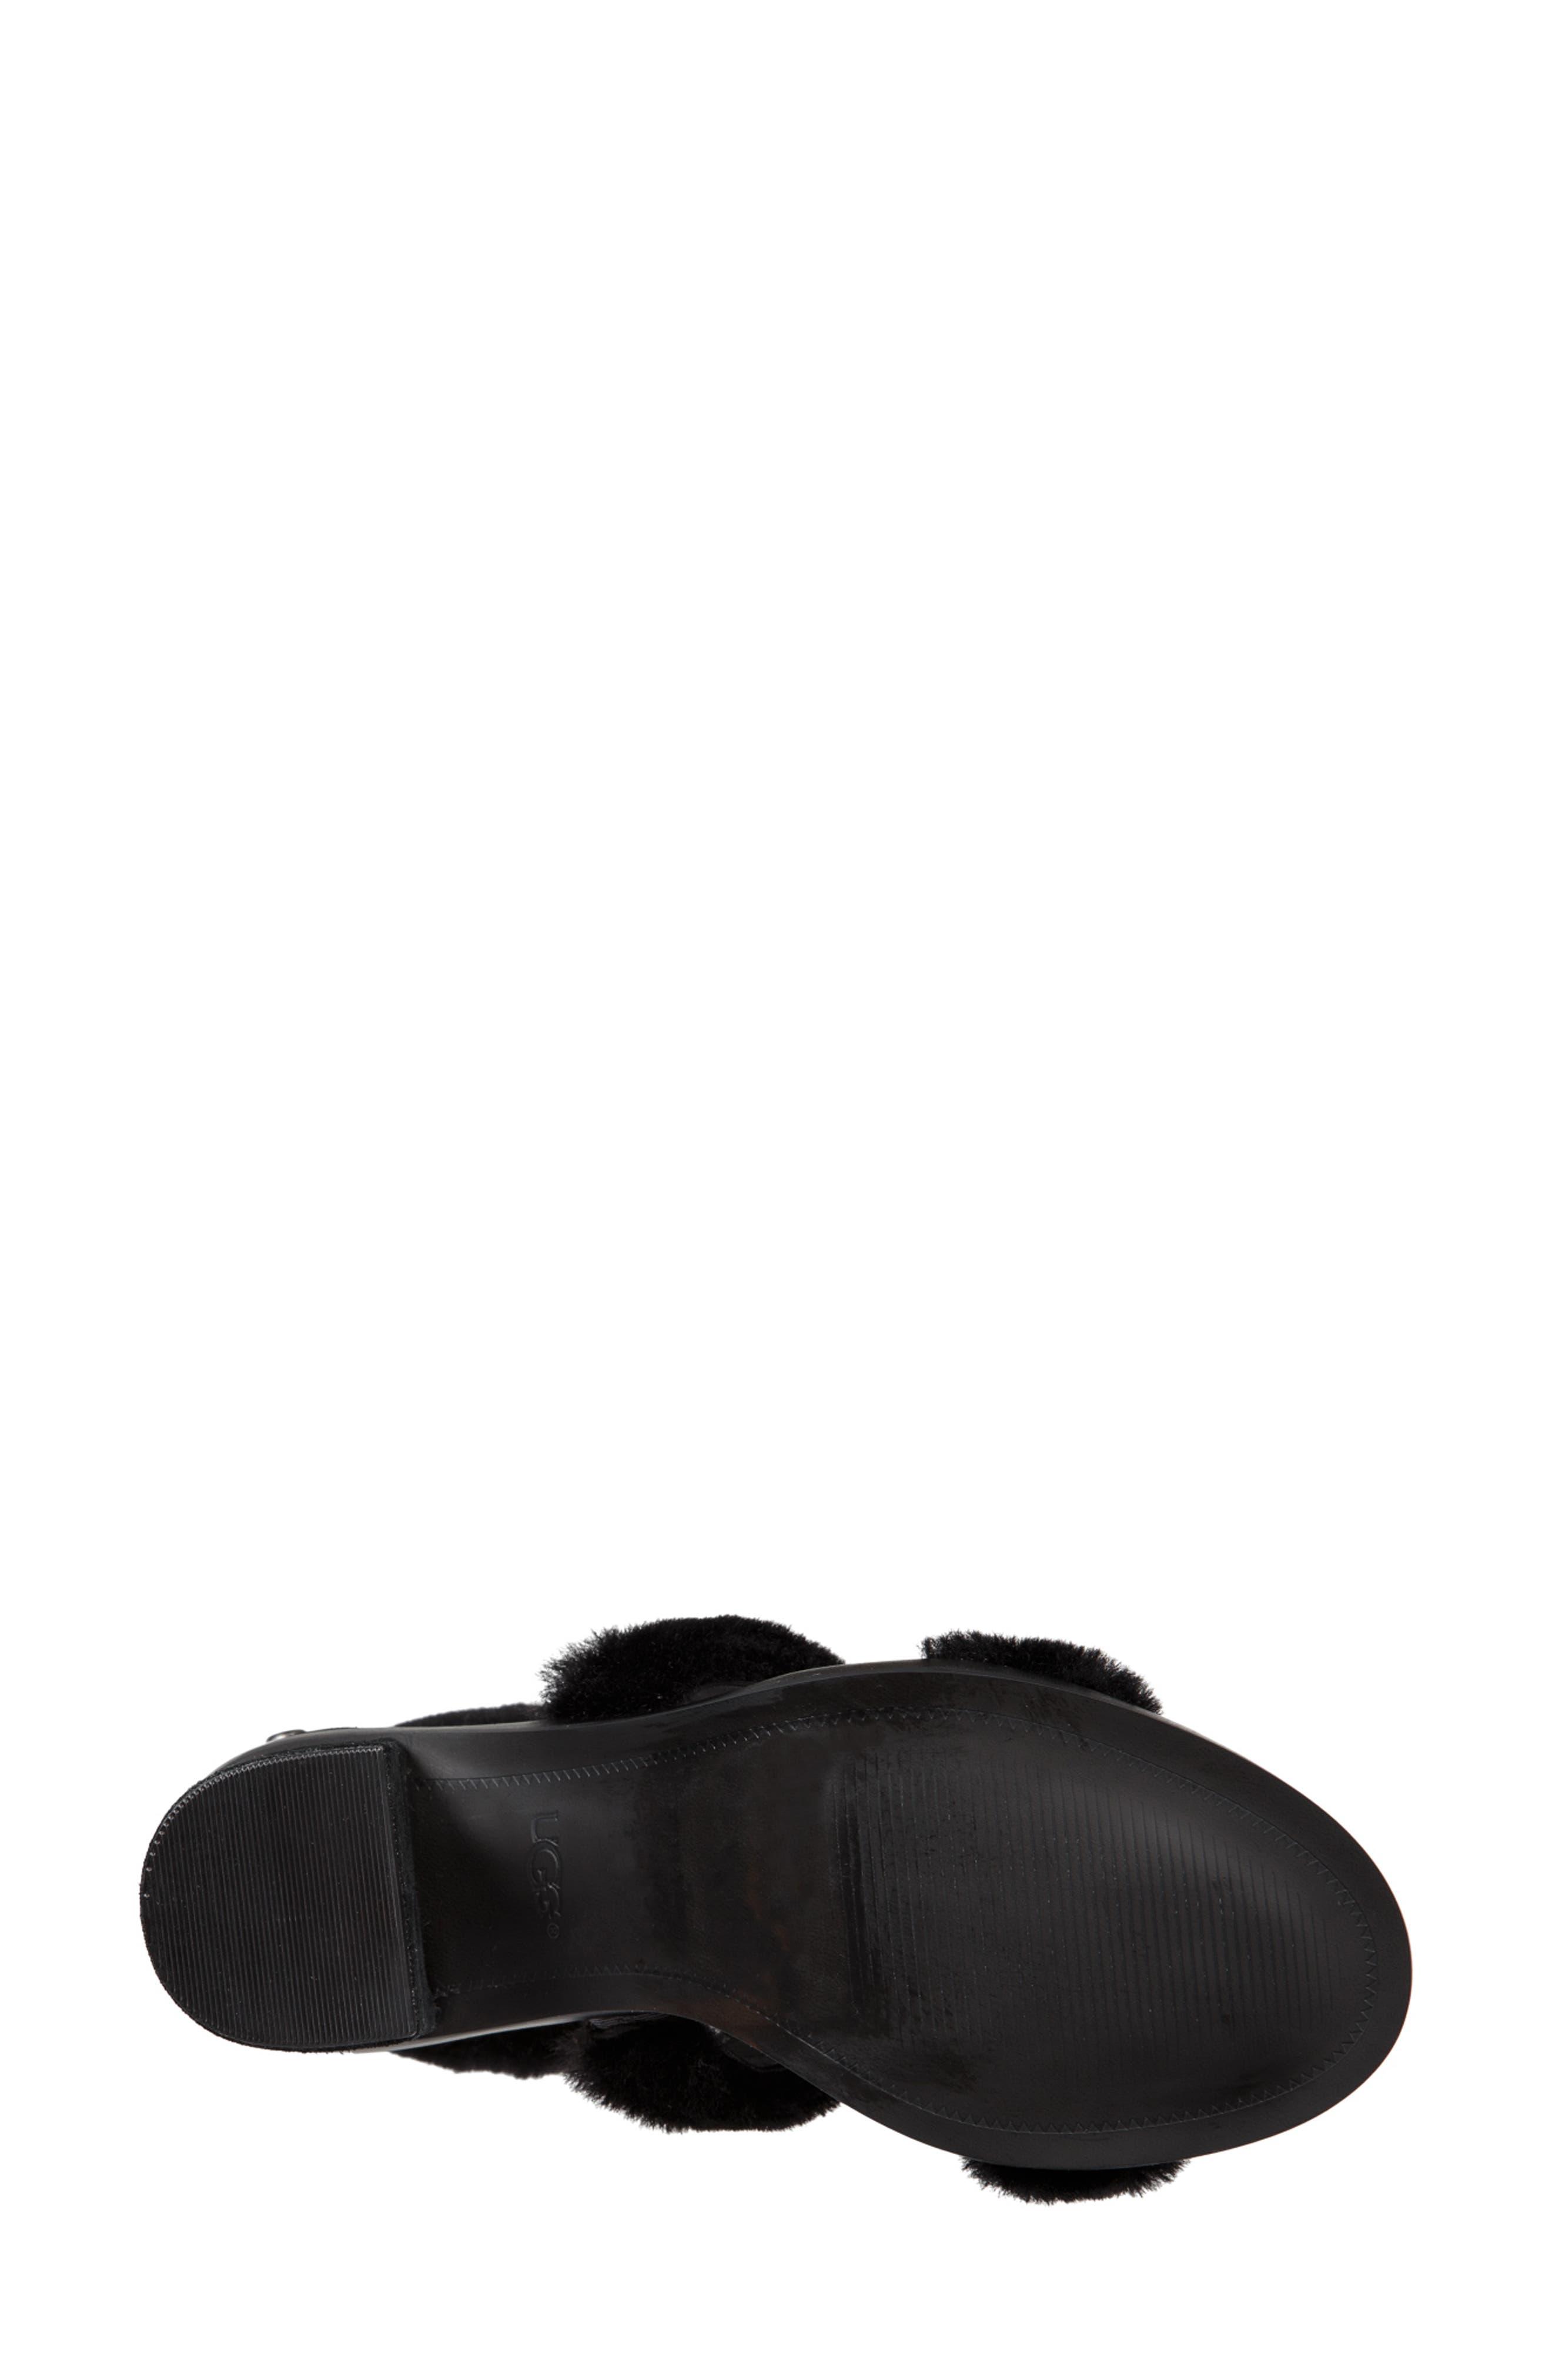 Dey Rey Genuine Shearling Sandal,                             Alternate thumbnail 5, color,                             BLACK